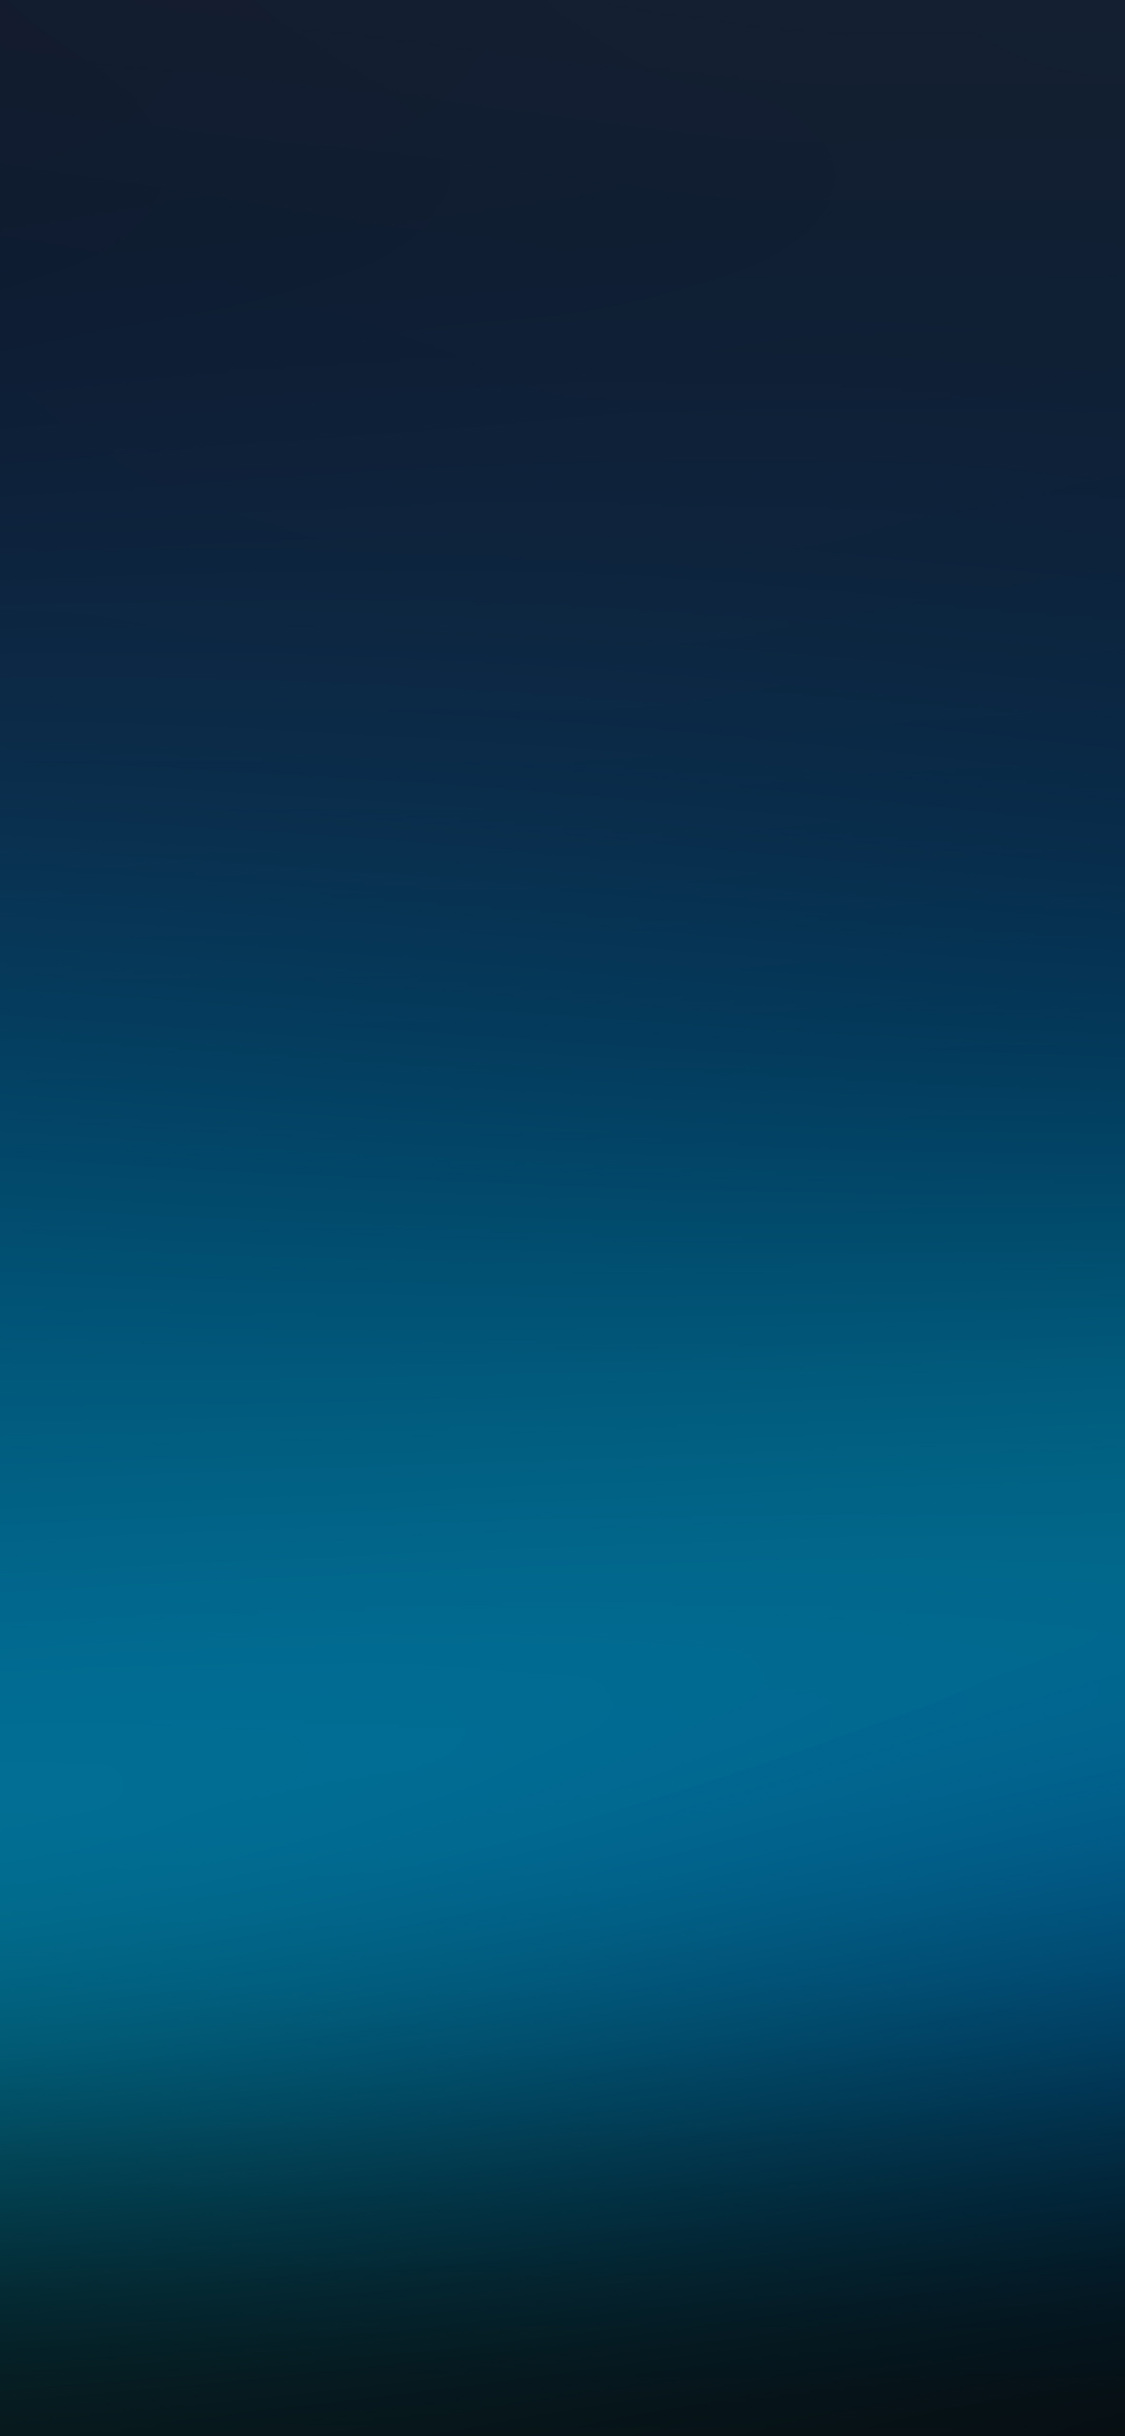 sj21-blue-dark-sky-soft-night-gradation-blur-wallpaper